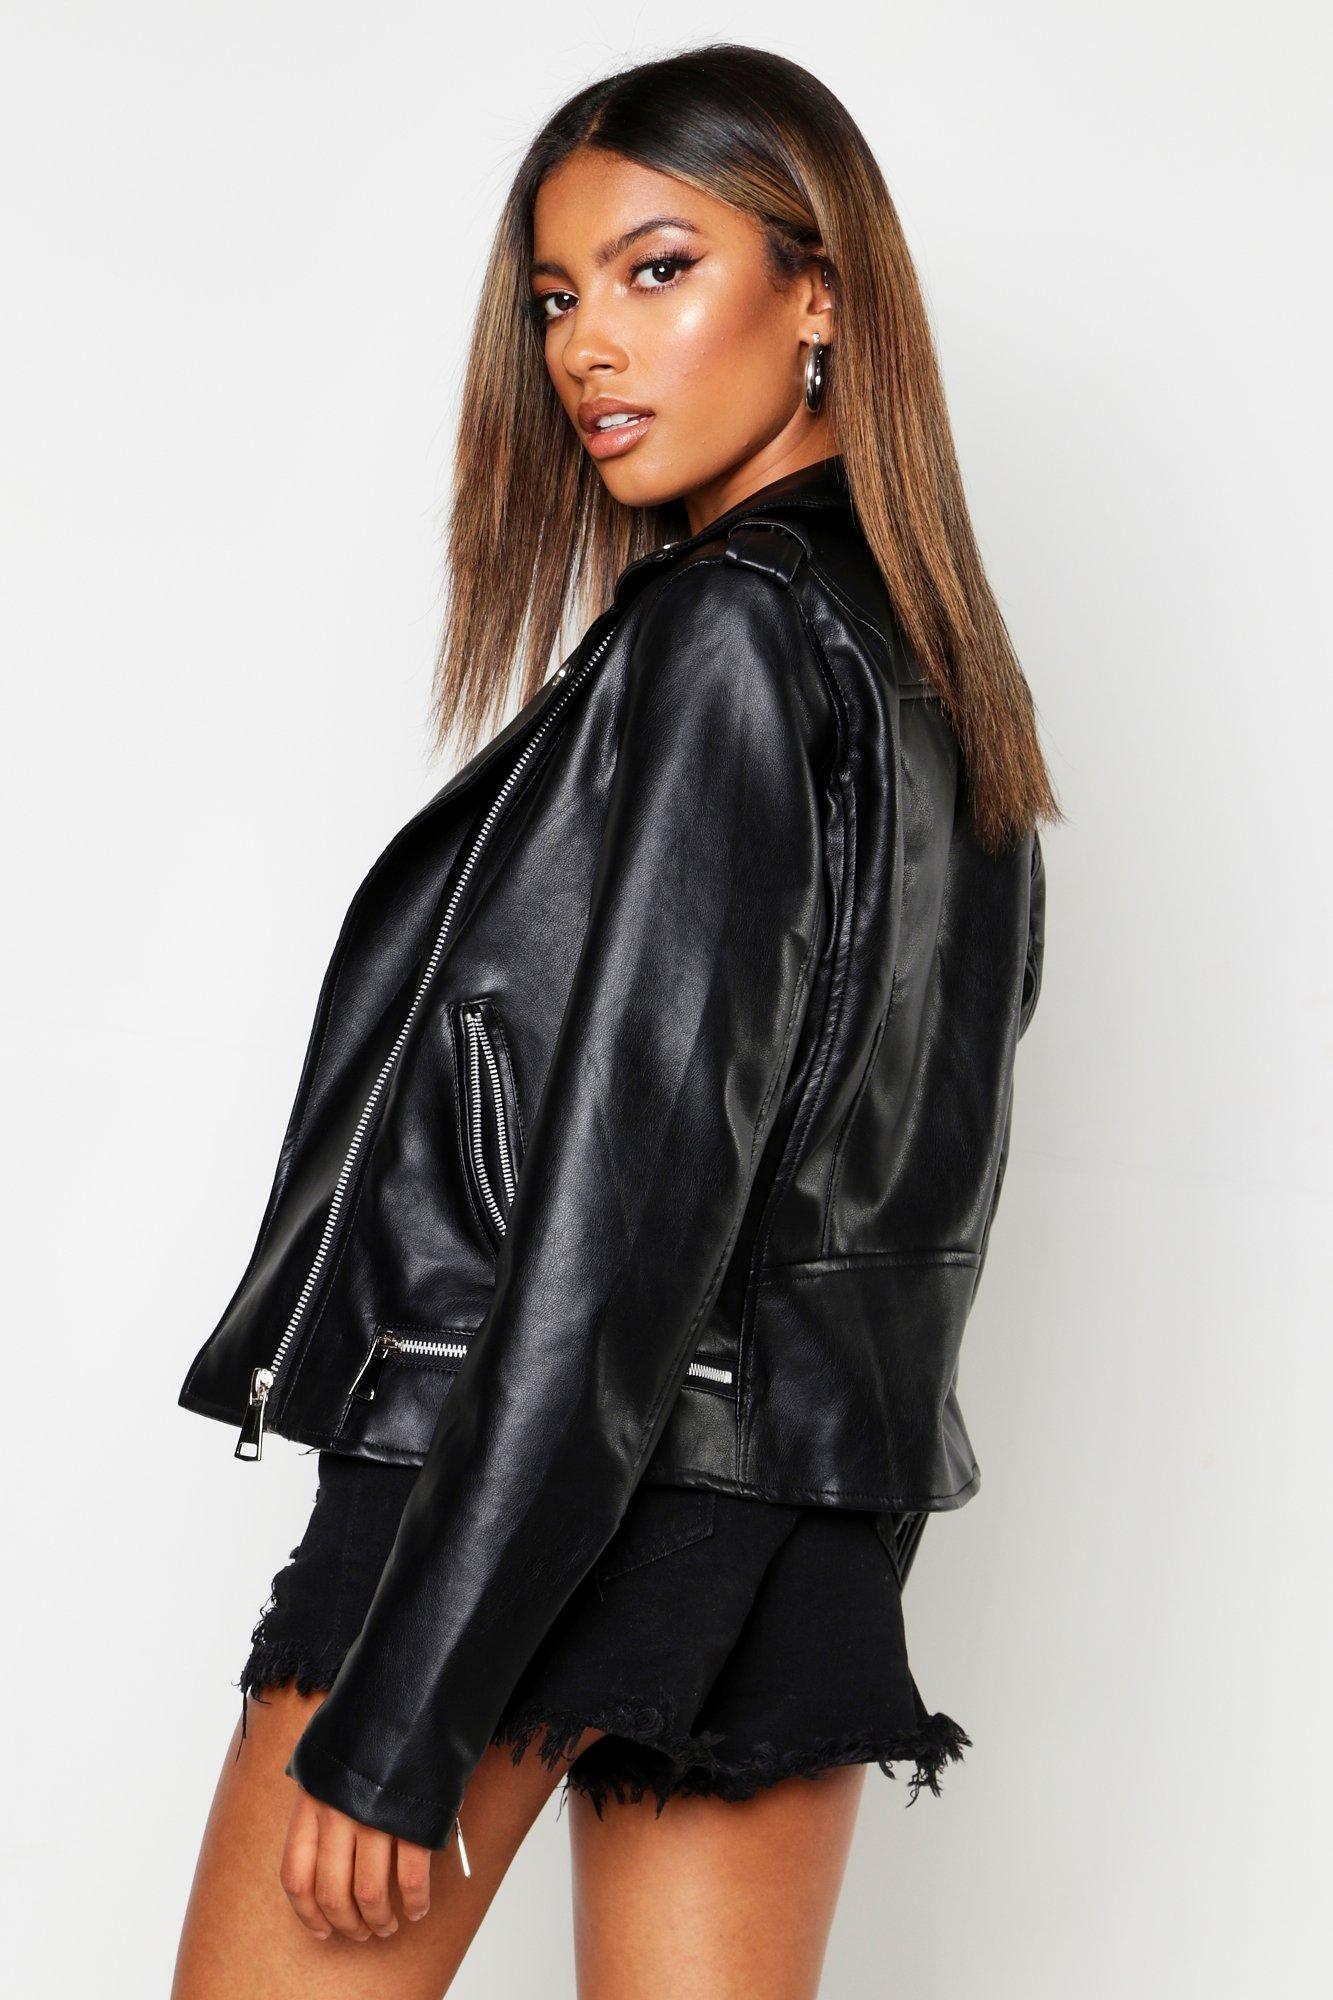 Zip Detail Faux Leather Biker Jacket Boohoo Fashion